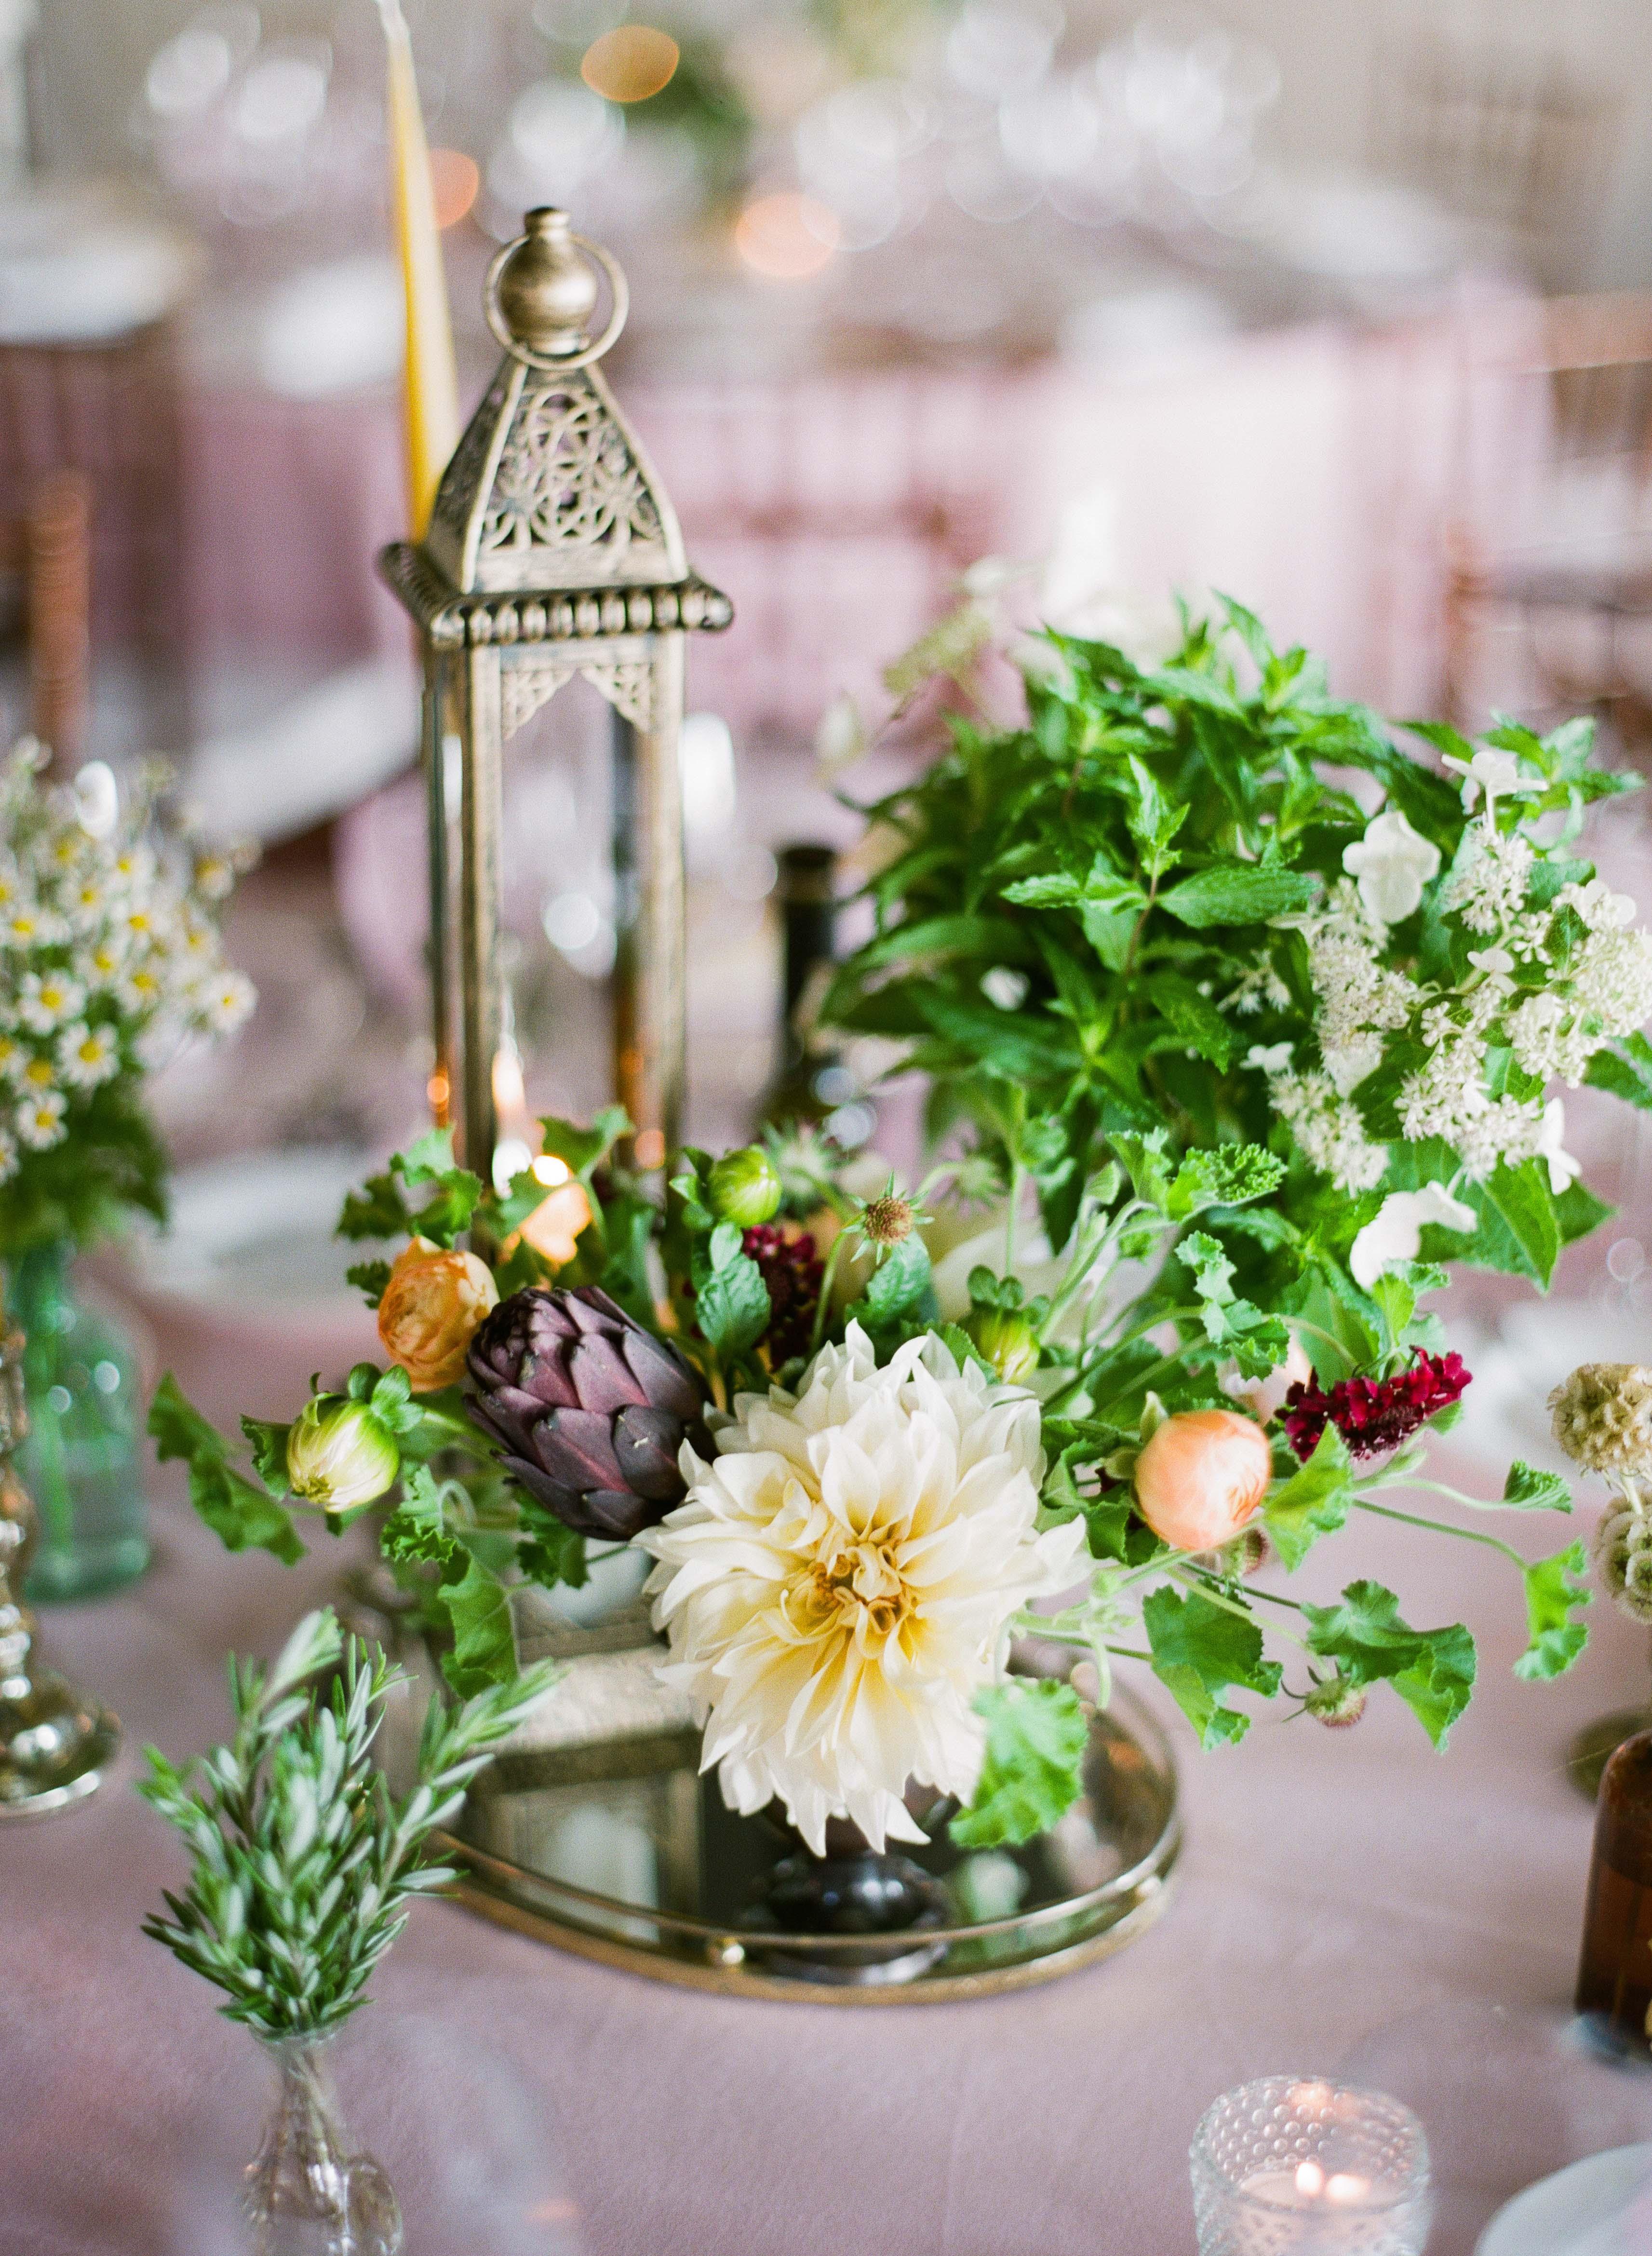 dahlia wedding centerpieces bushy red and yellow assortment